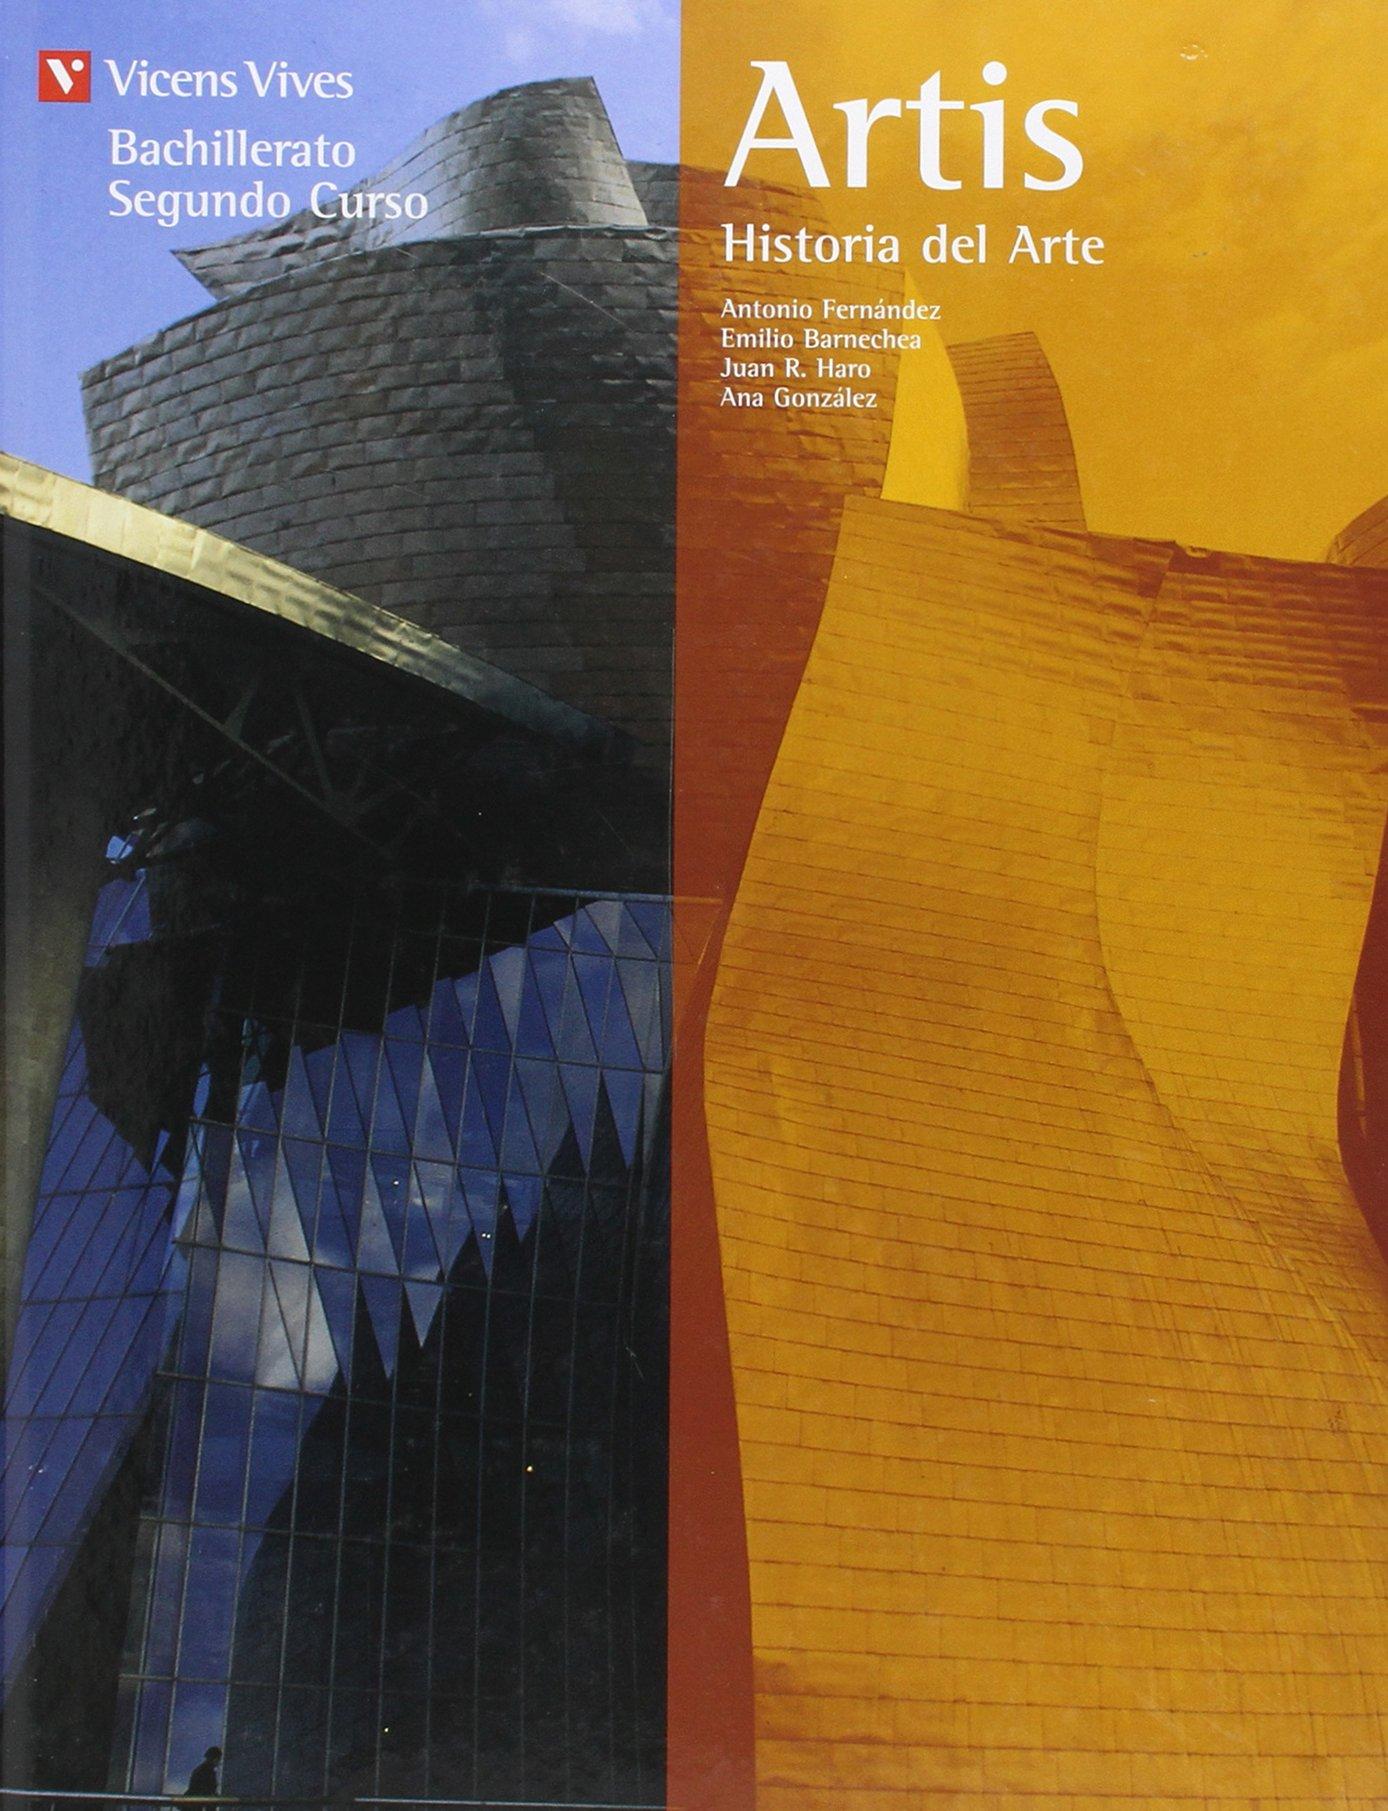 Artis, Historia del Arte, Segundo Curso Bachillerato: Amazon.es: Fernandez Garcia, Antonio, Barnechea Salo, Emilio, Gonzalez, Ana, Haro Sabater, Juan: Libros